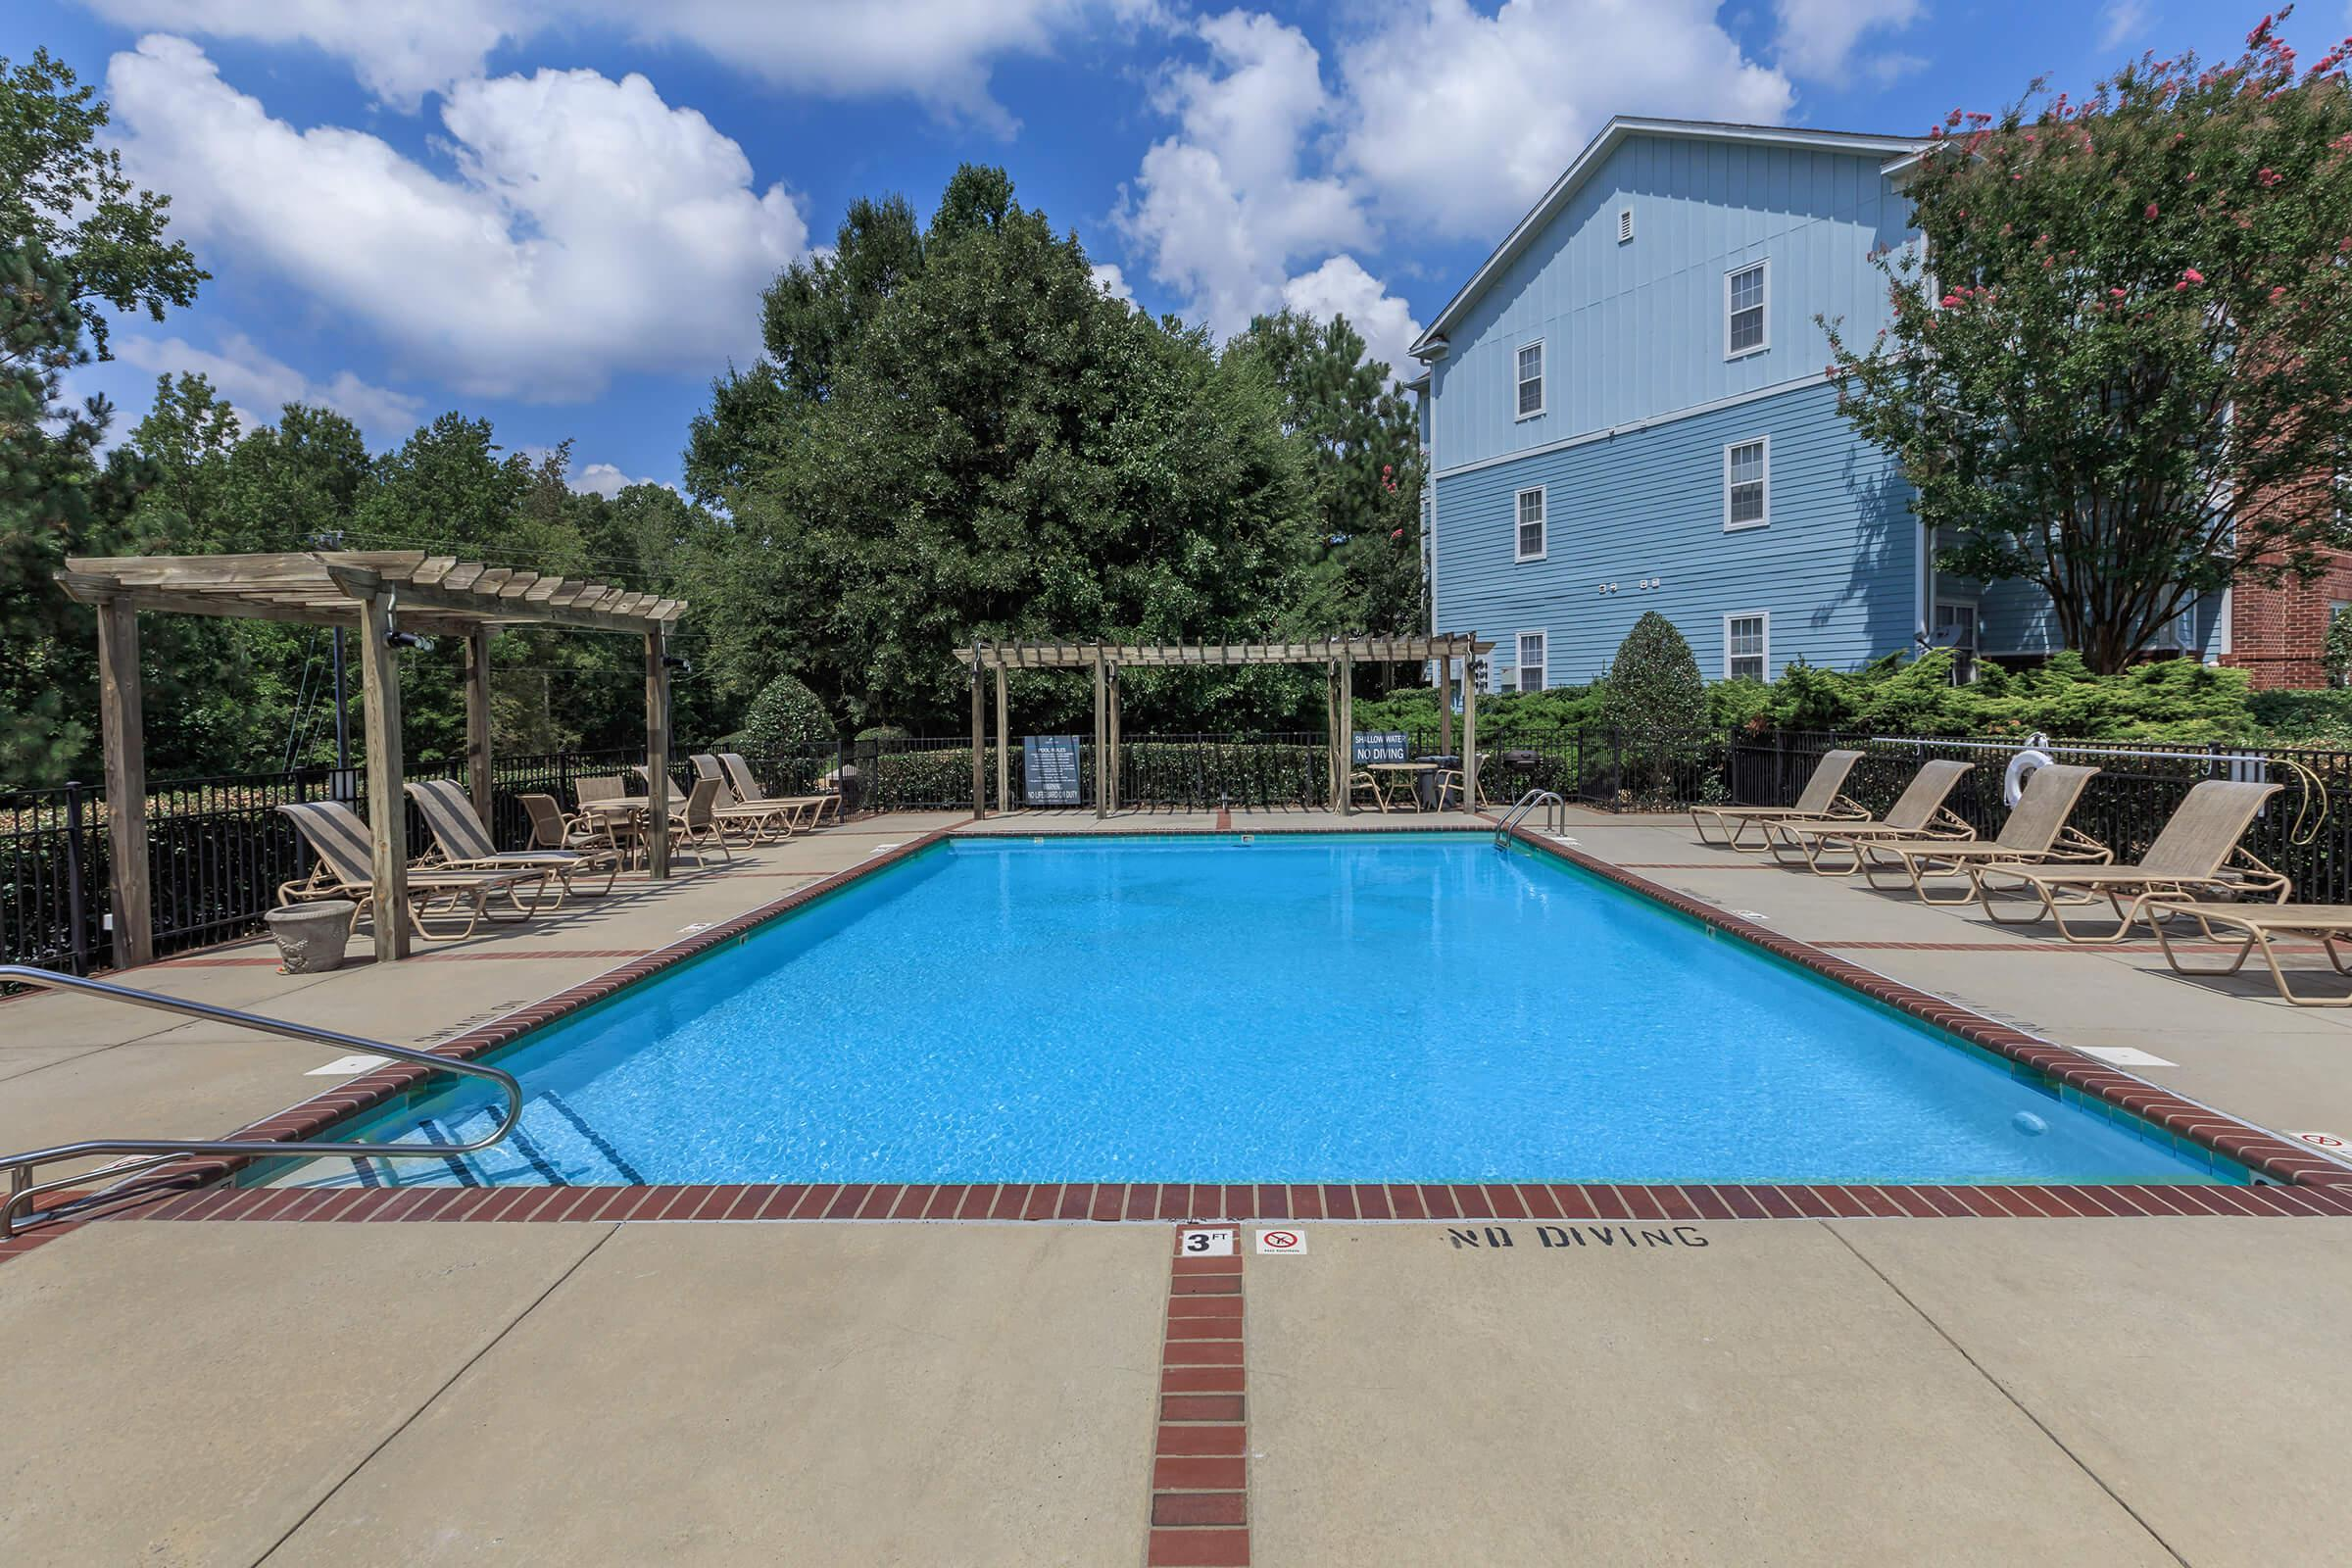 a blue pool